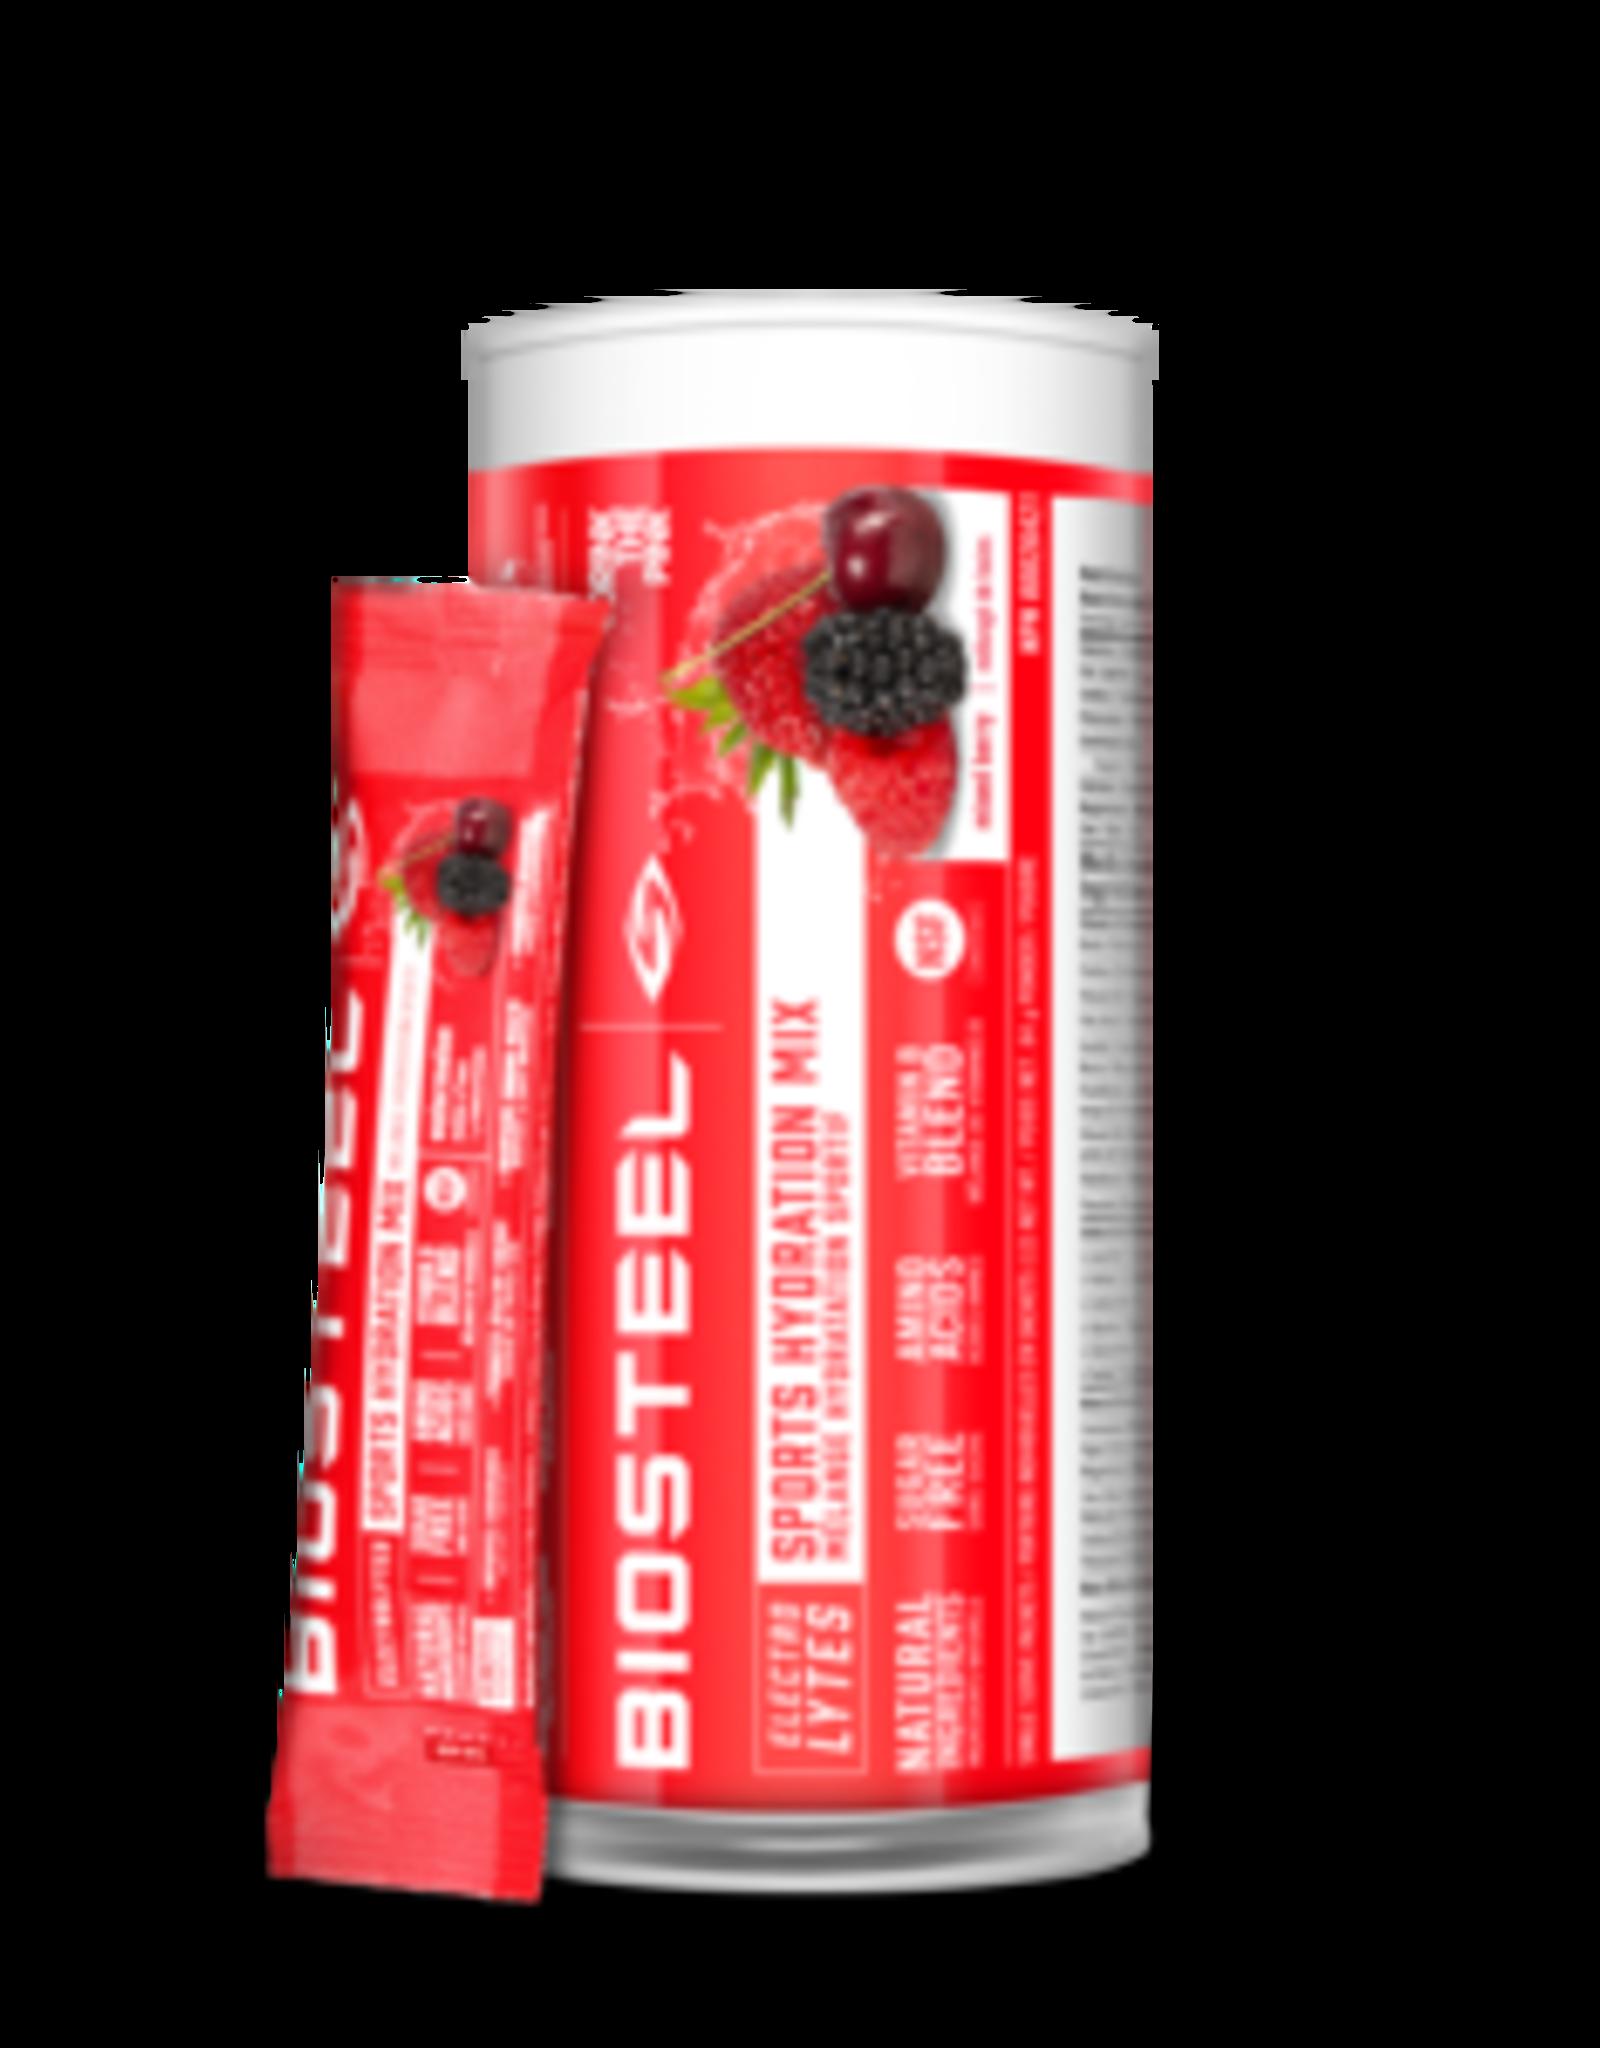 BioSteel Biosteel - Boisson Sportive - Électrolytes, Baies Mélangées (12x7g)